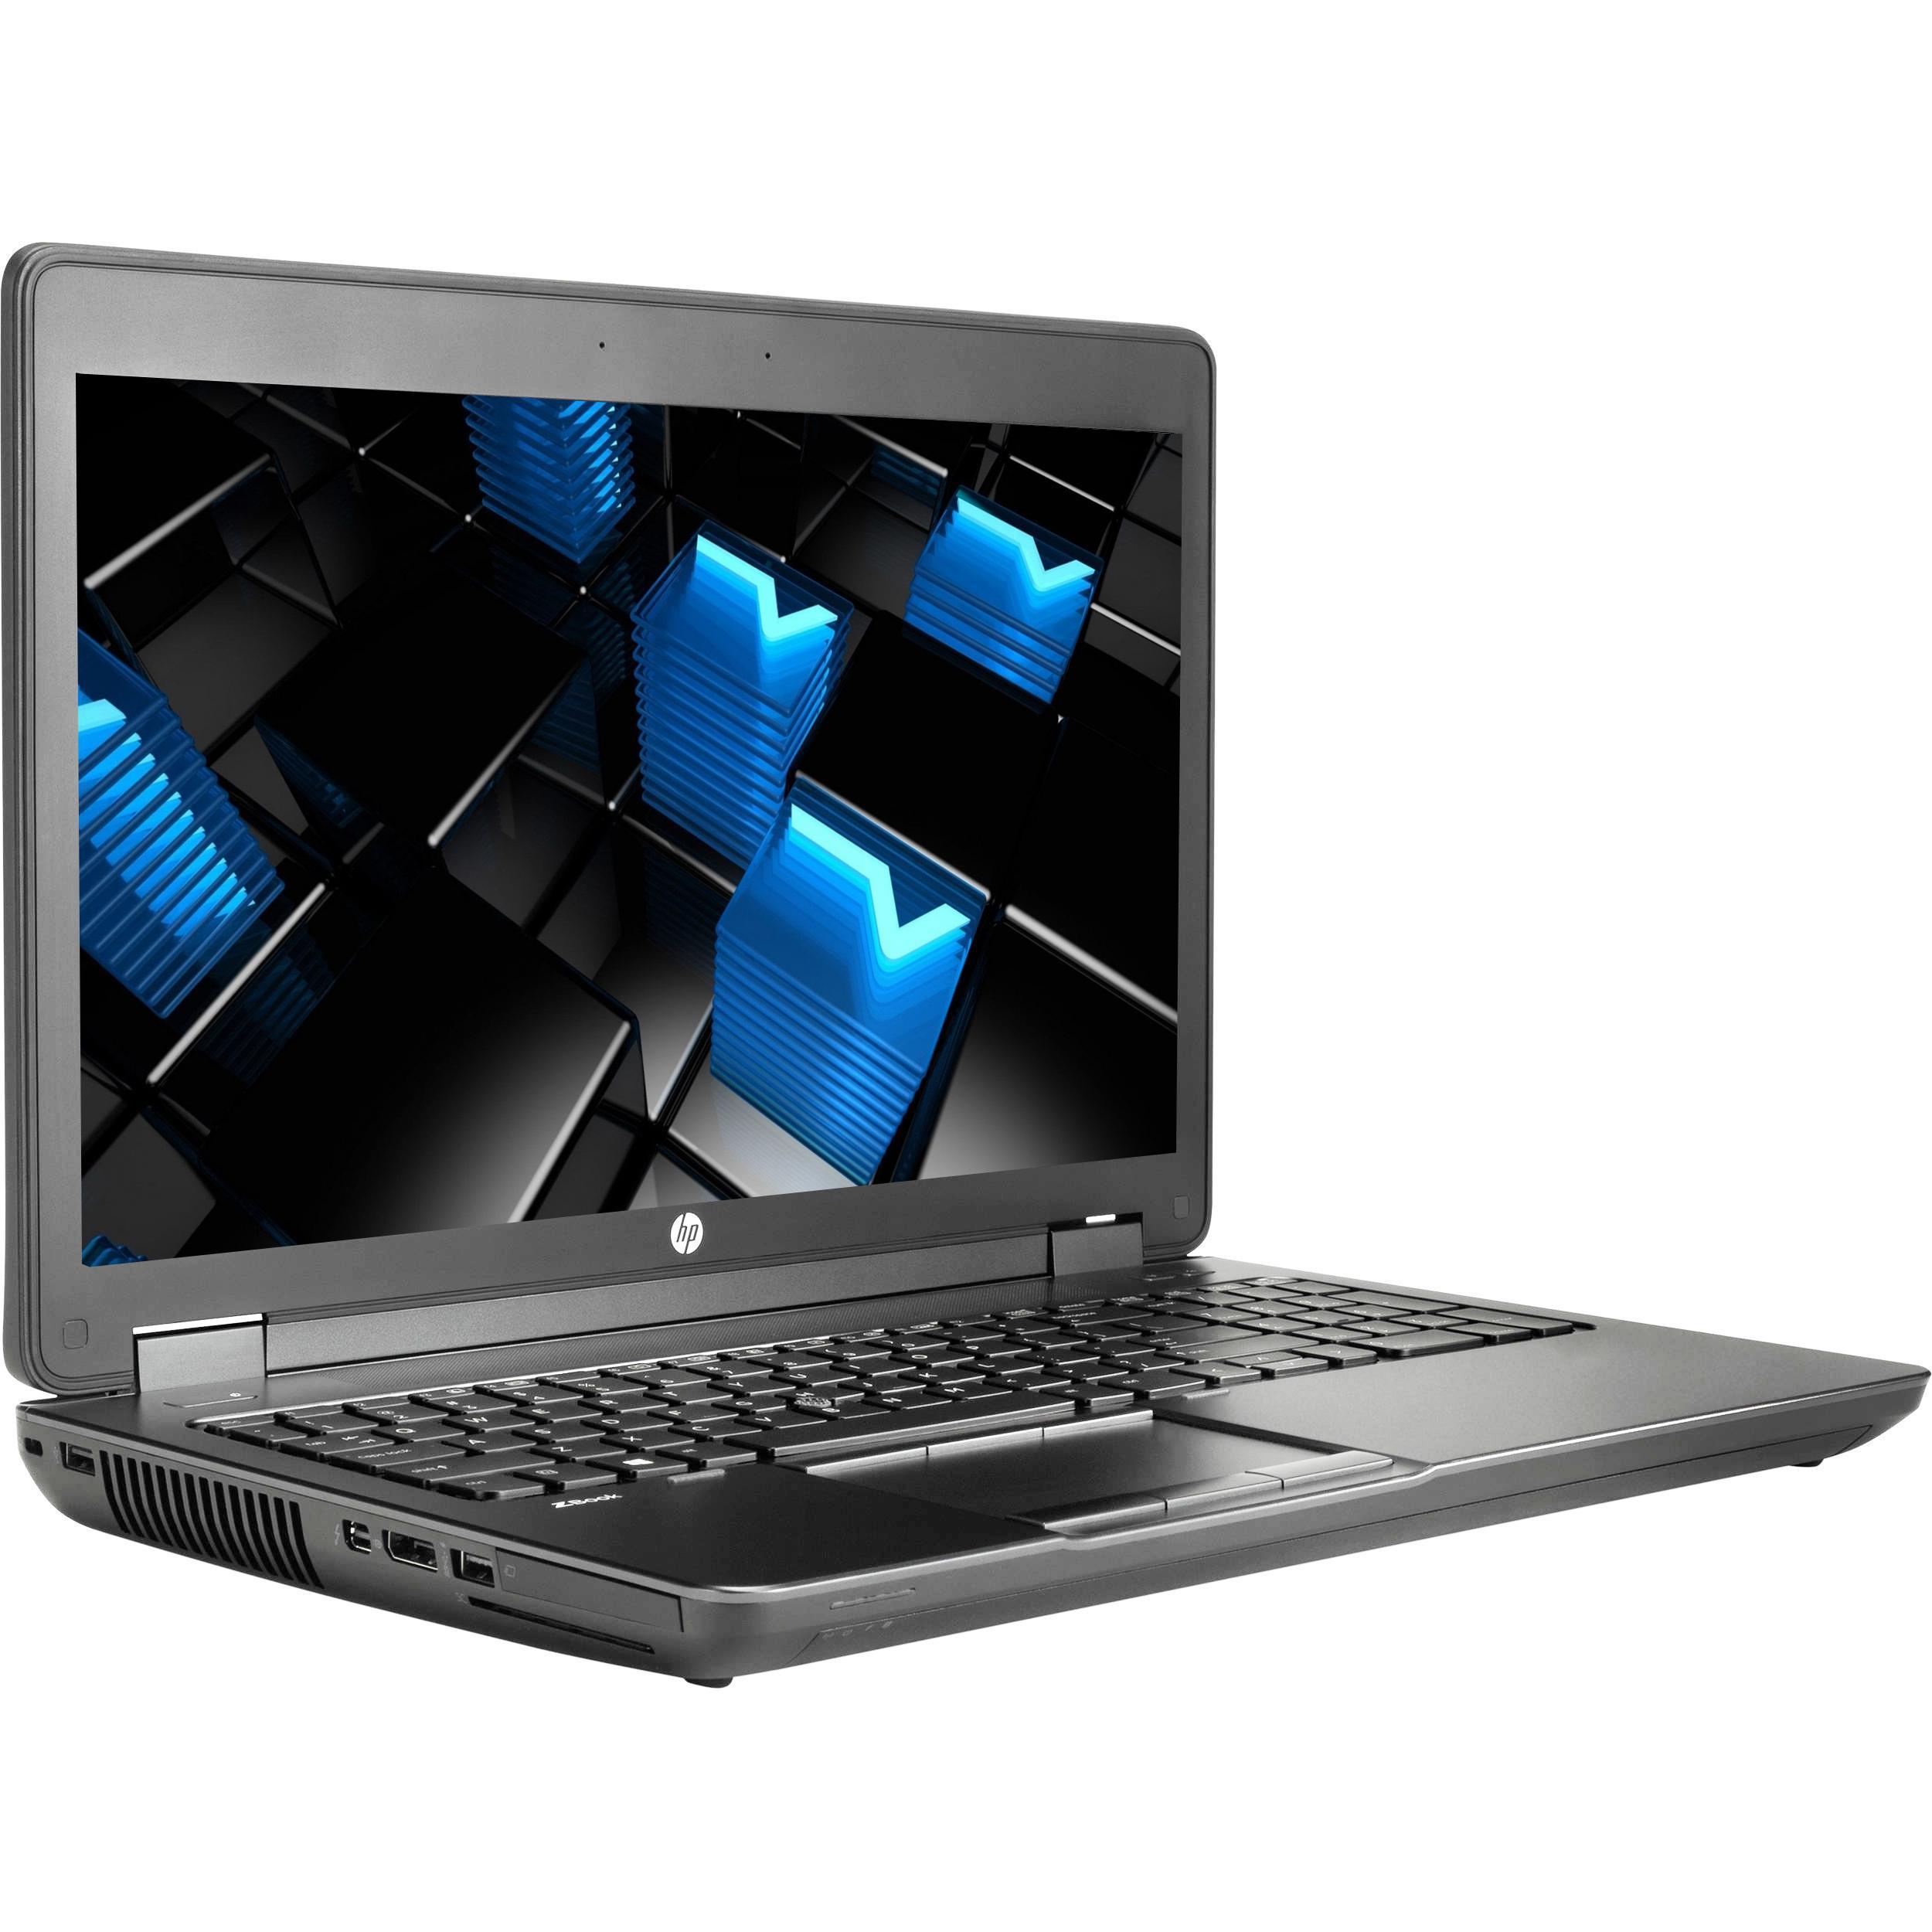 1GB 2GB 4GB 8GB 2G 4G PC2 PC3 DDR2 DDR3 667Mhz 800Mhz 1333hz 1600Mhz 5300S 6400 8500 10600 ECC